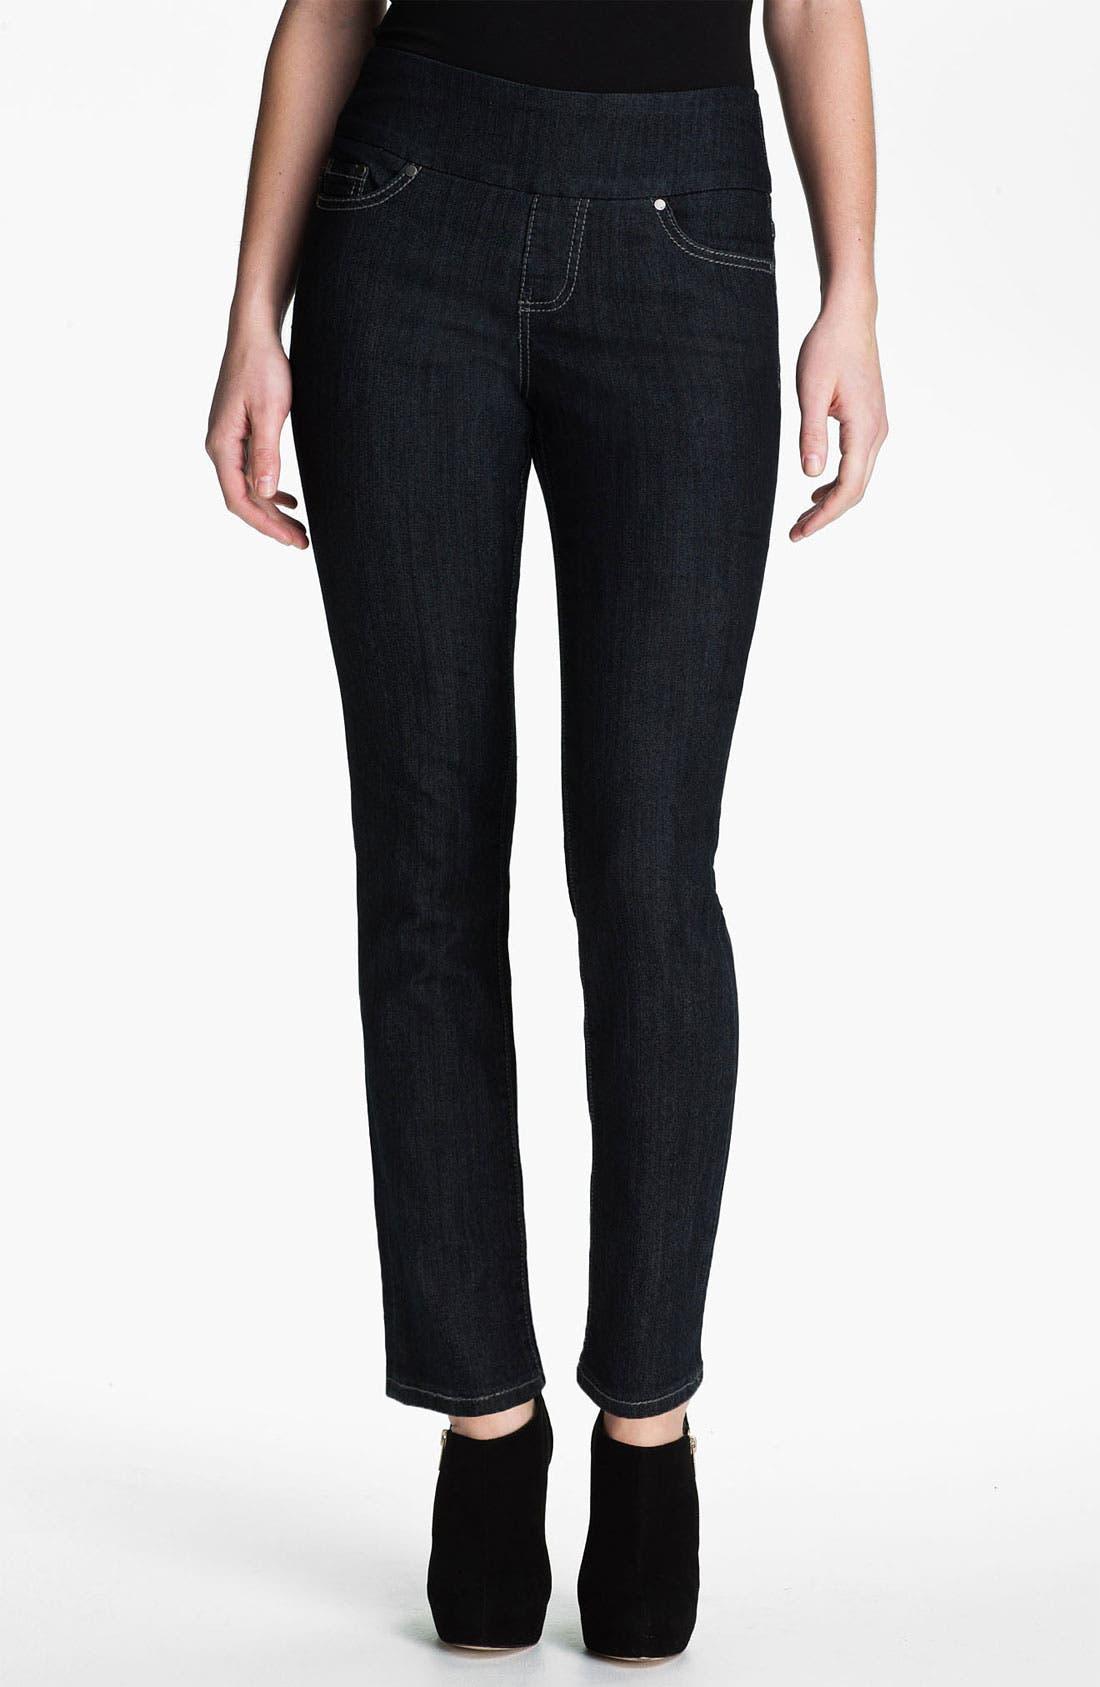 Alternate Image 1 Selected - Jag Jeans 'Holland' Straight Leg Pull-On Jeans (Petite)